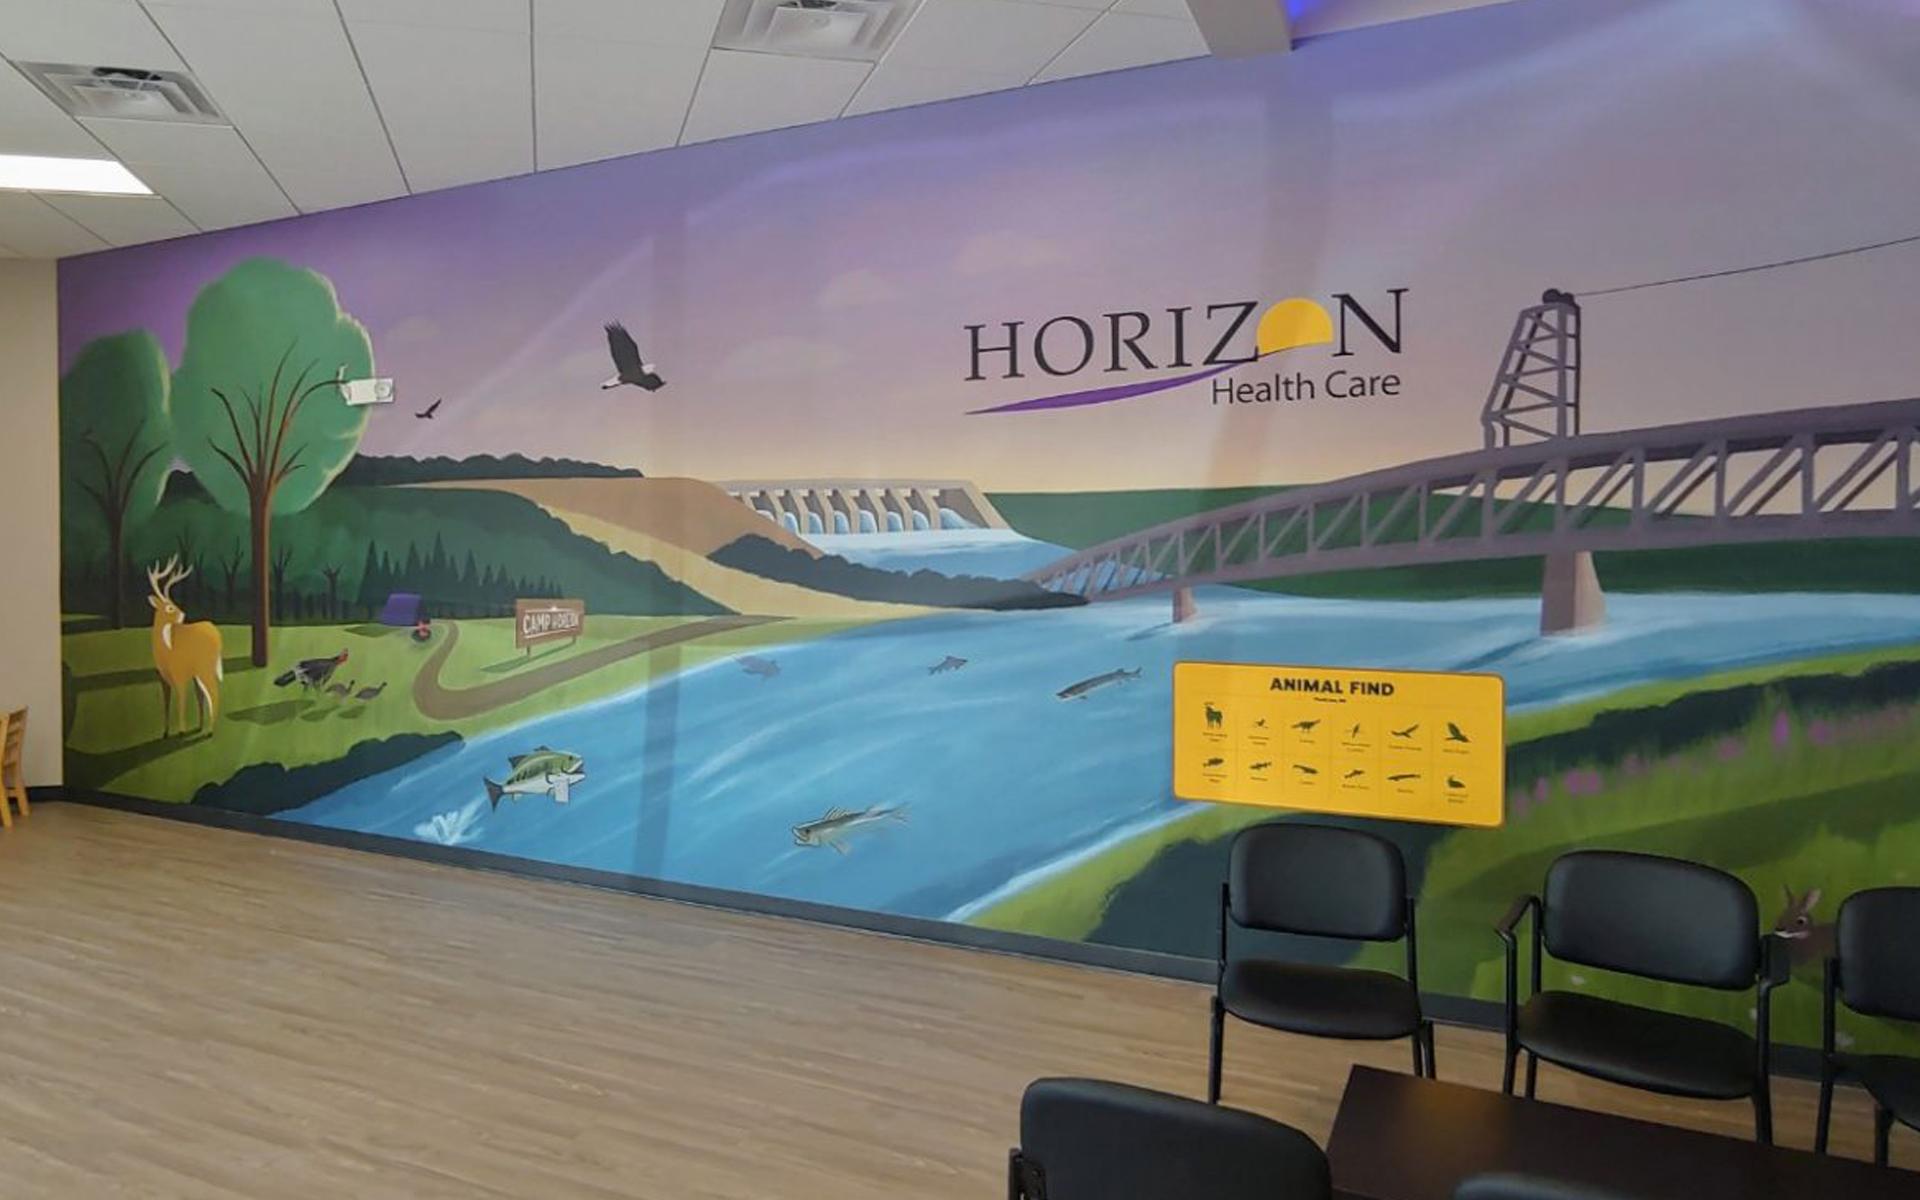 Horizon Healthcare mural